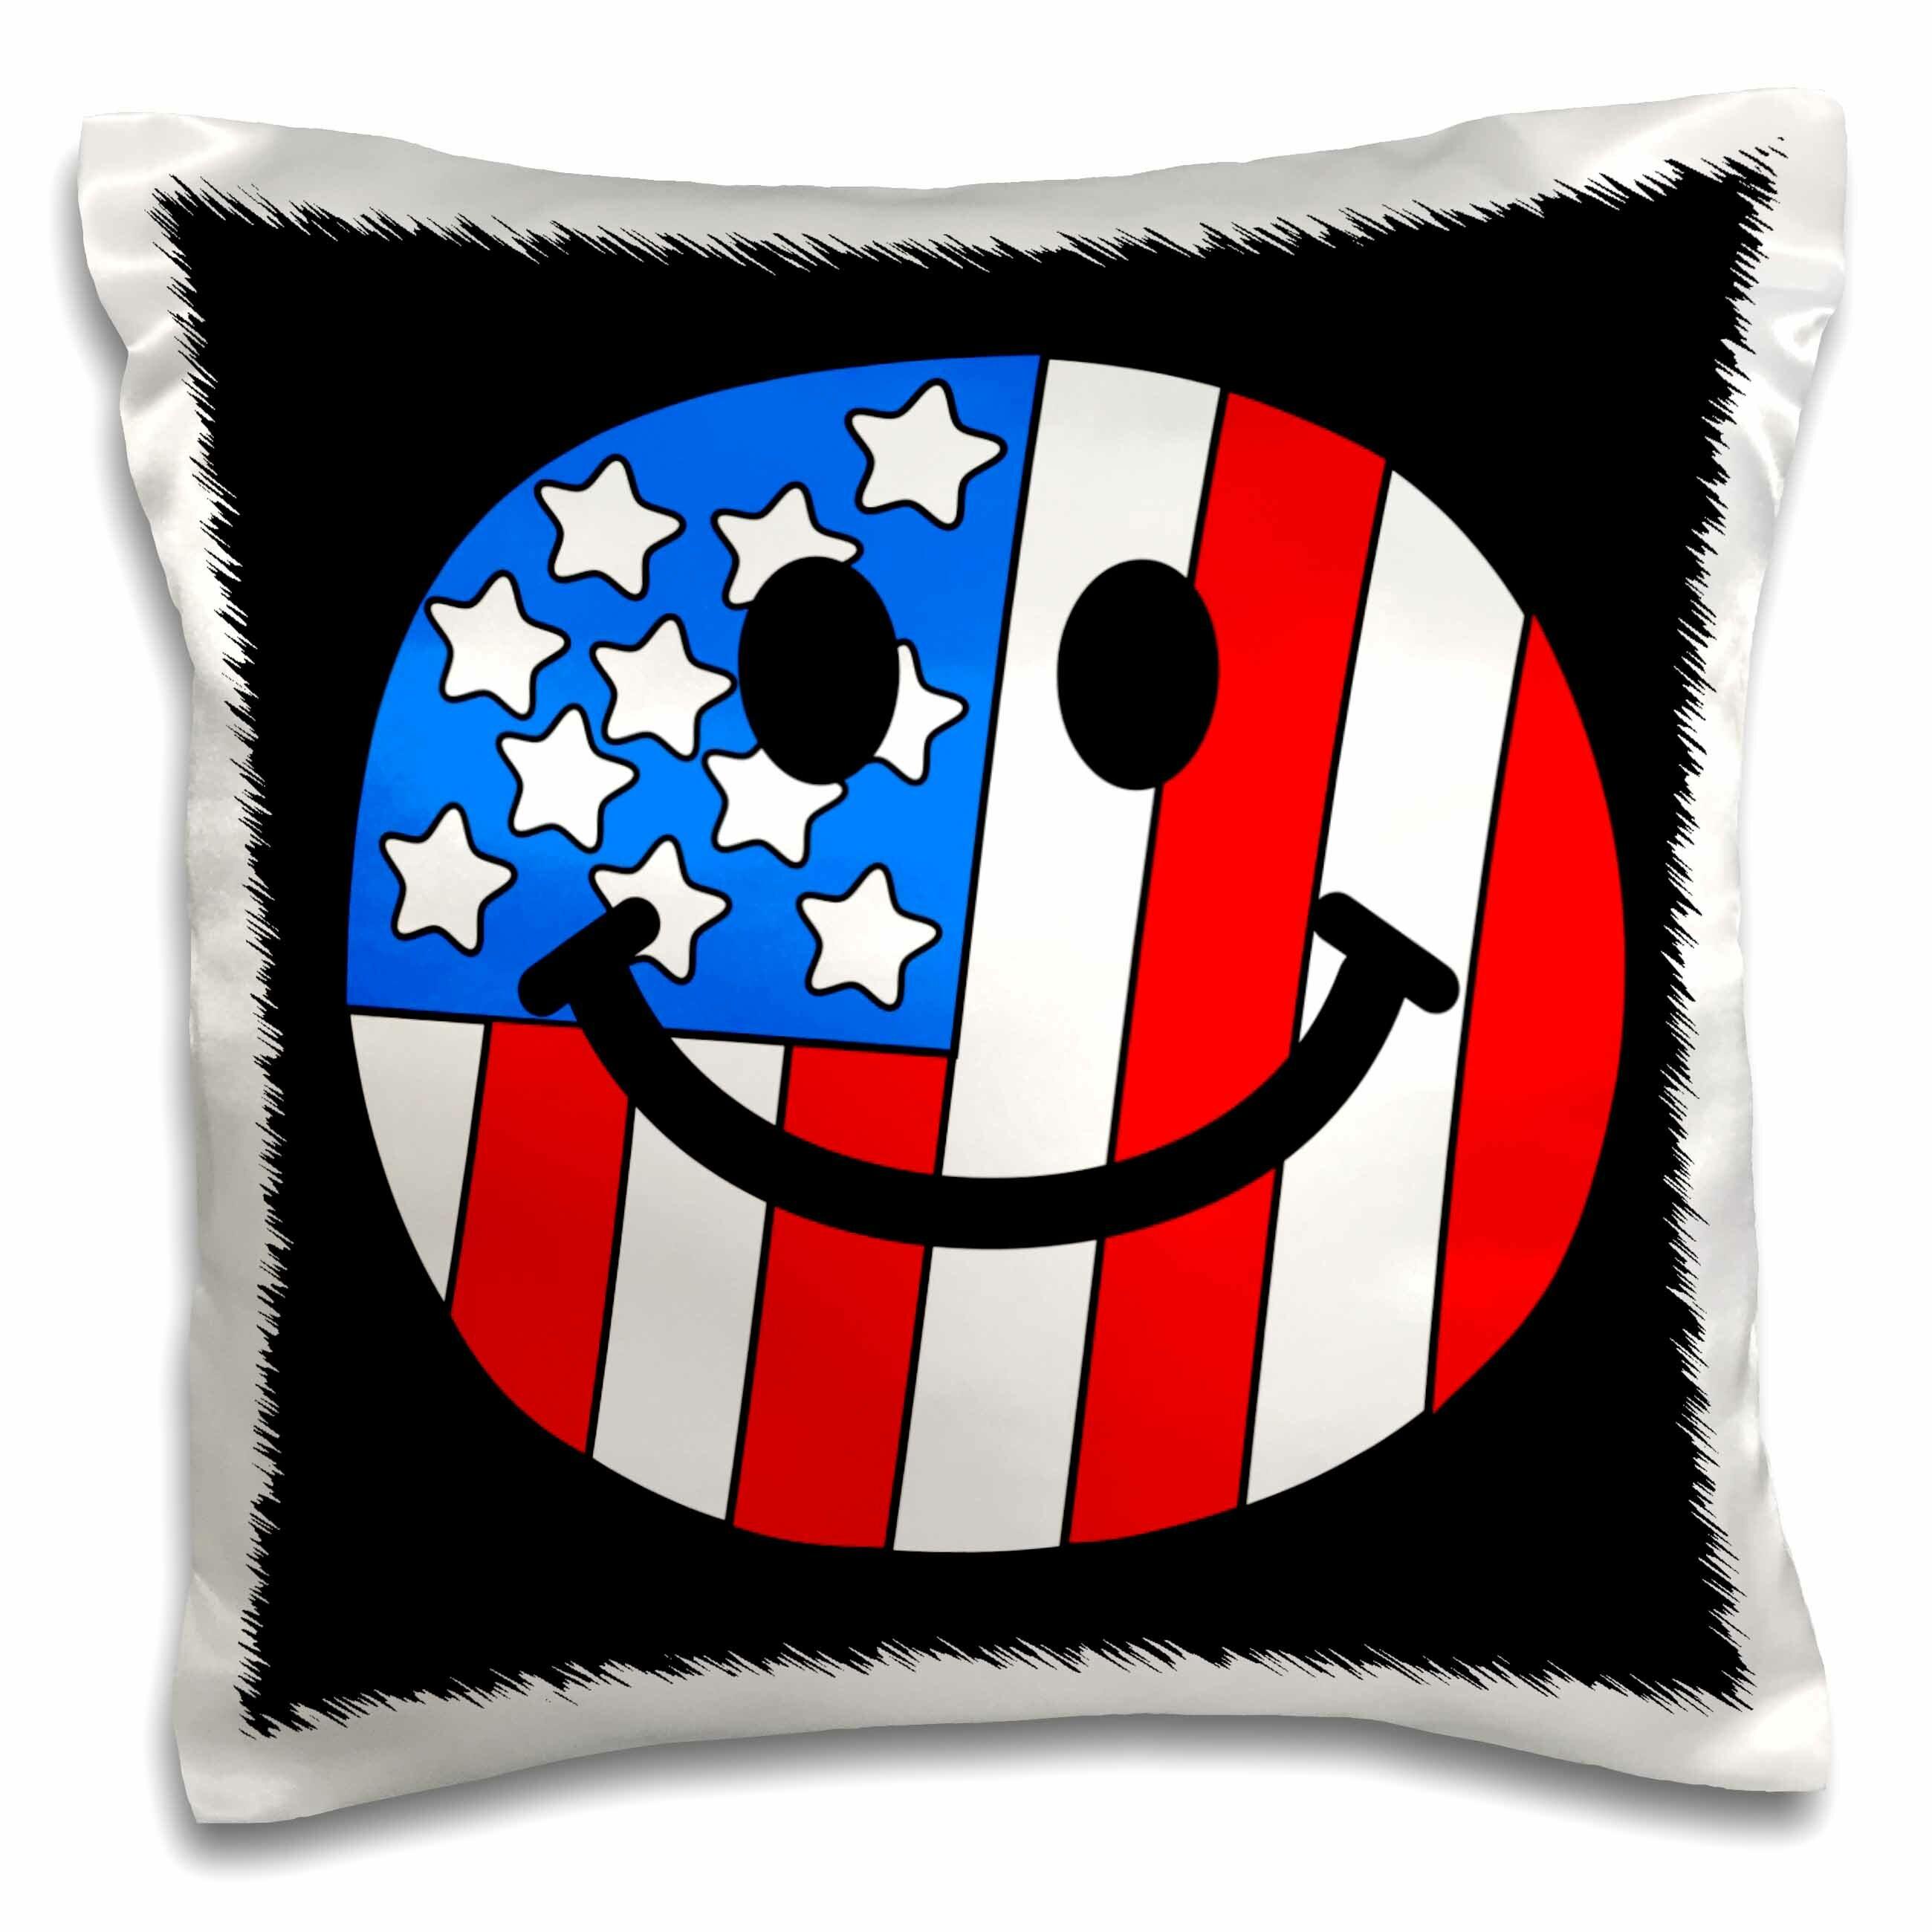 East Urban Home American Flag Smiley Face Pillow Cover Wayfair